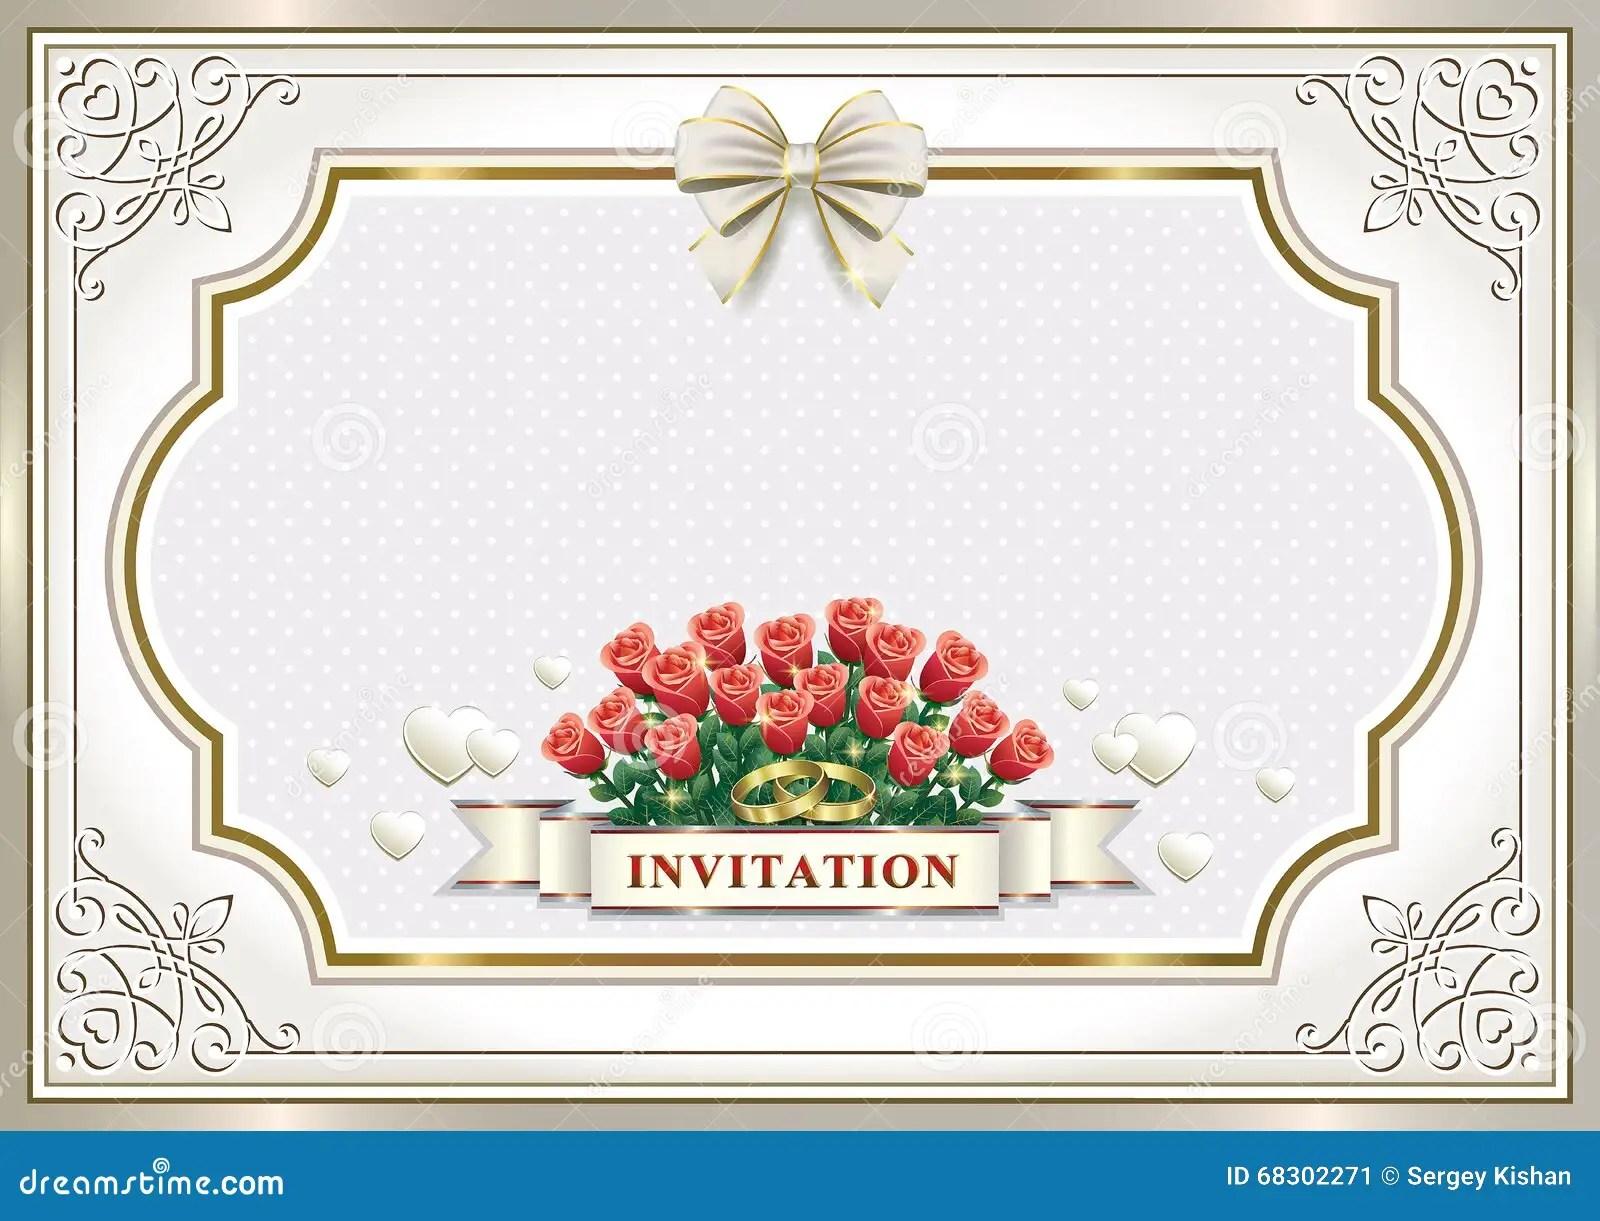 beautiful wedding invitation card stock vector illustration of marriage card 68302271